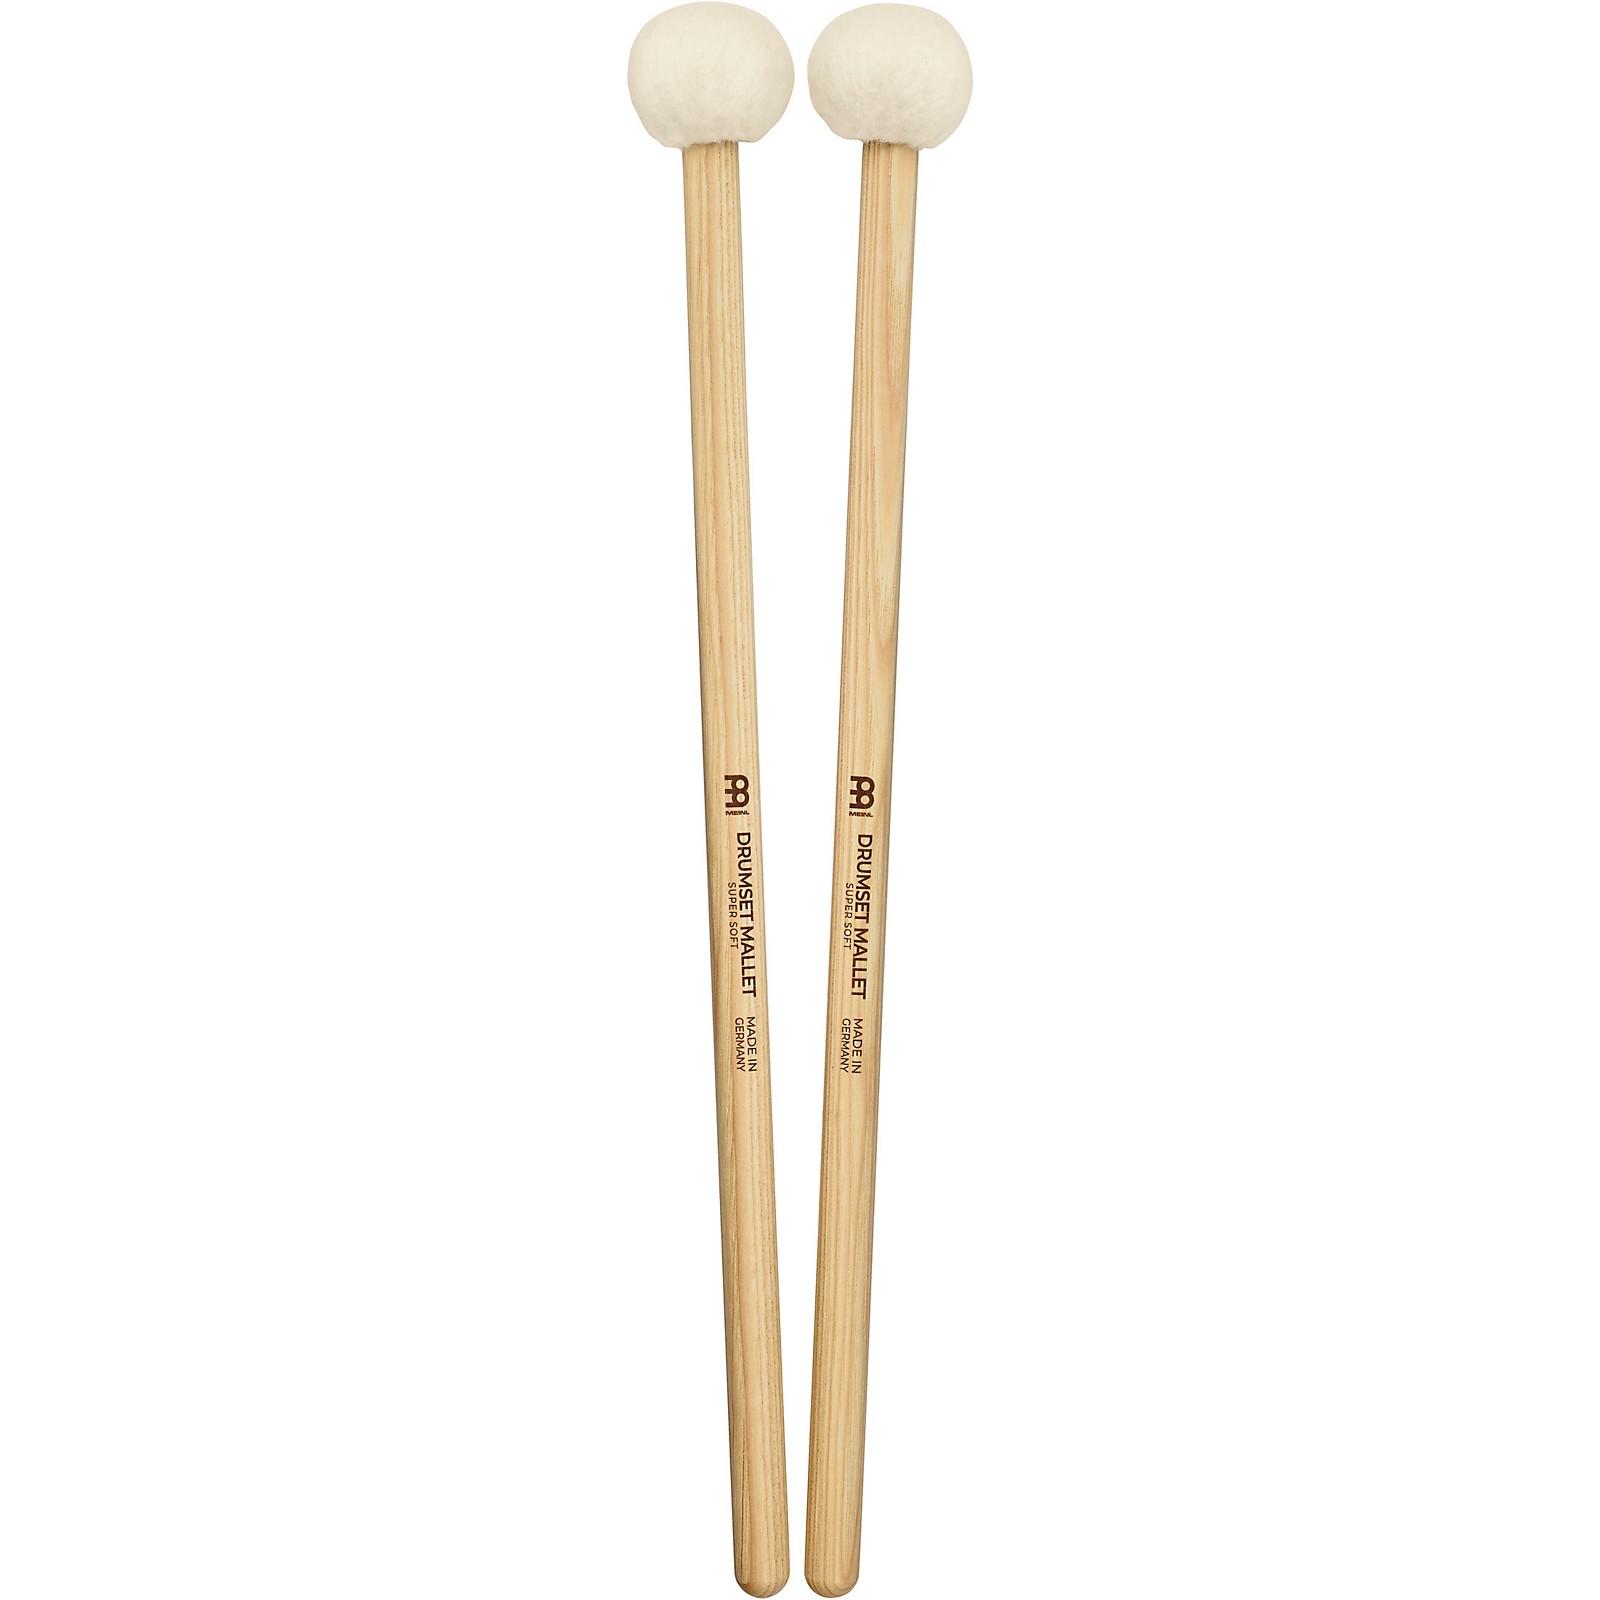 Meinl Stick & Brush Super Soft Mallets